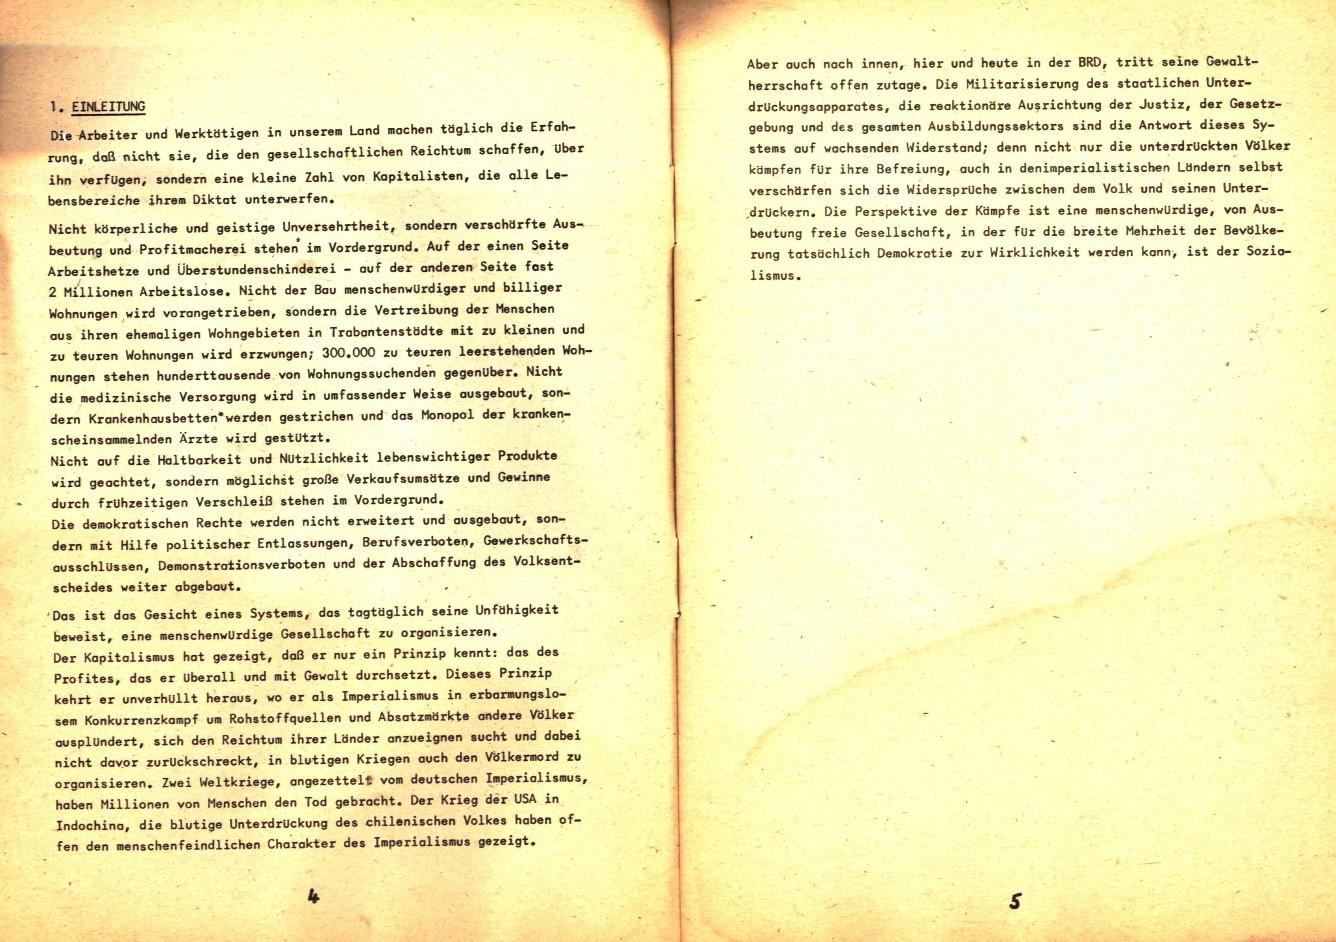 Berlin_BSLE_1975_Grundlagenpapier_04